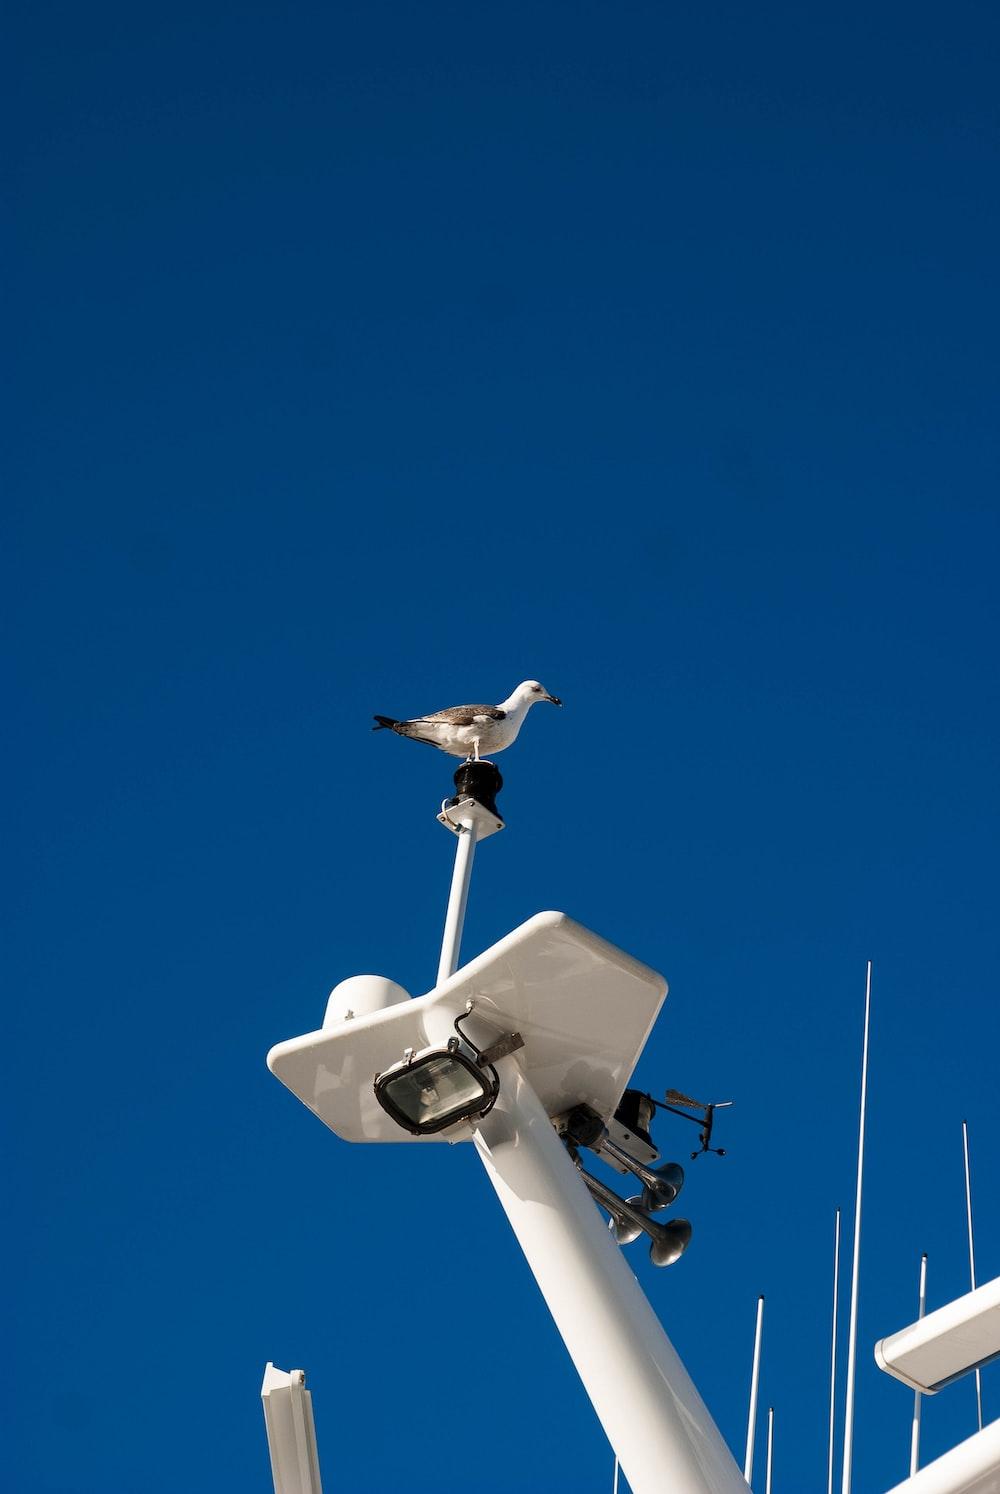 white bird perching on white metal post under blue sky during daytime